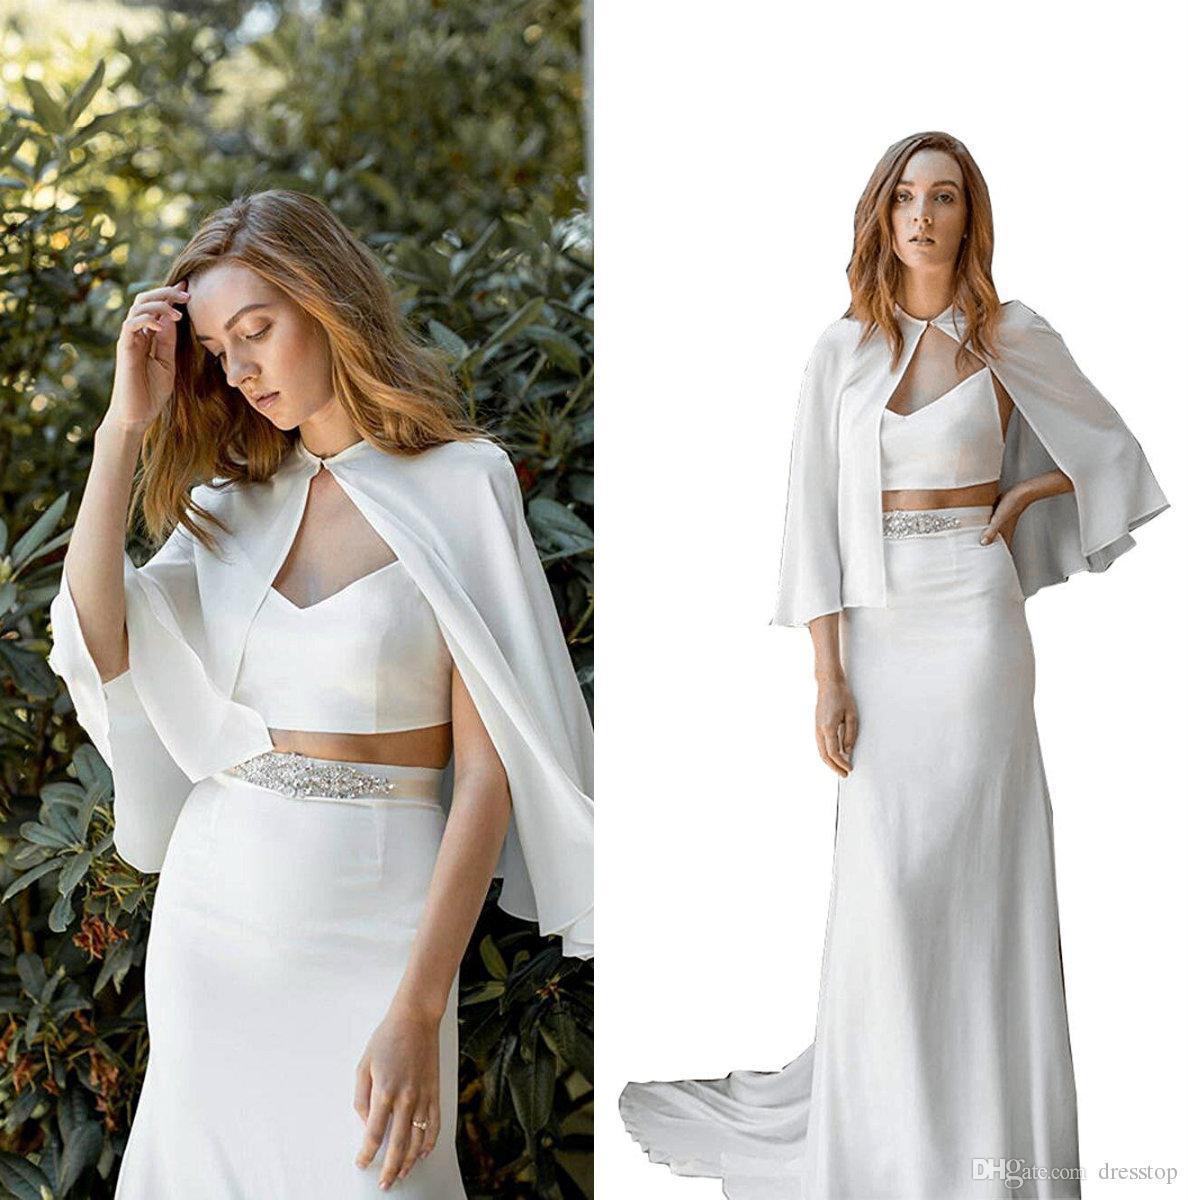 Cheap White Bridesmaid And Bride Capes Custom Made Chiffon Wedding Party Robe For Women Jackets Bolero Free Shipping